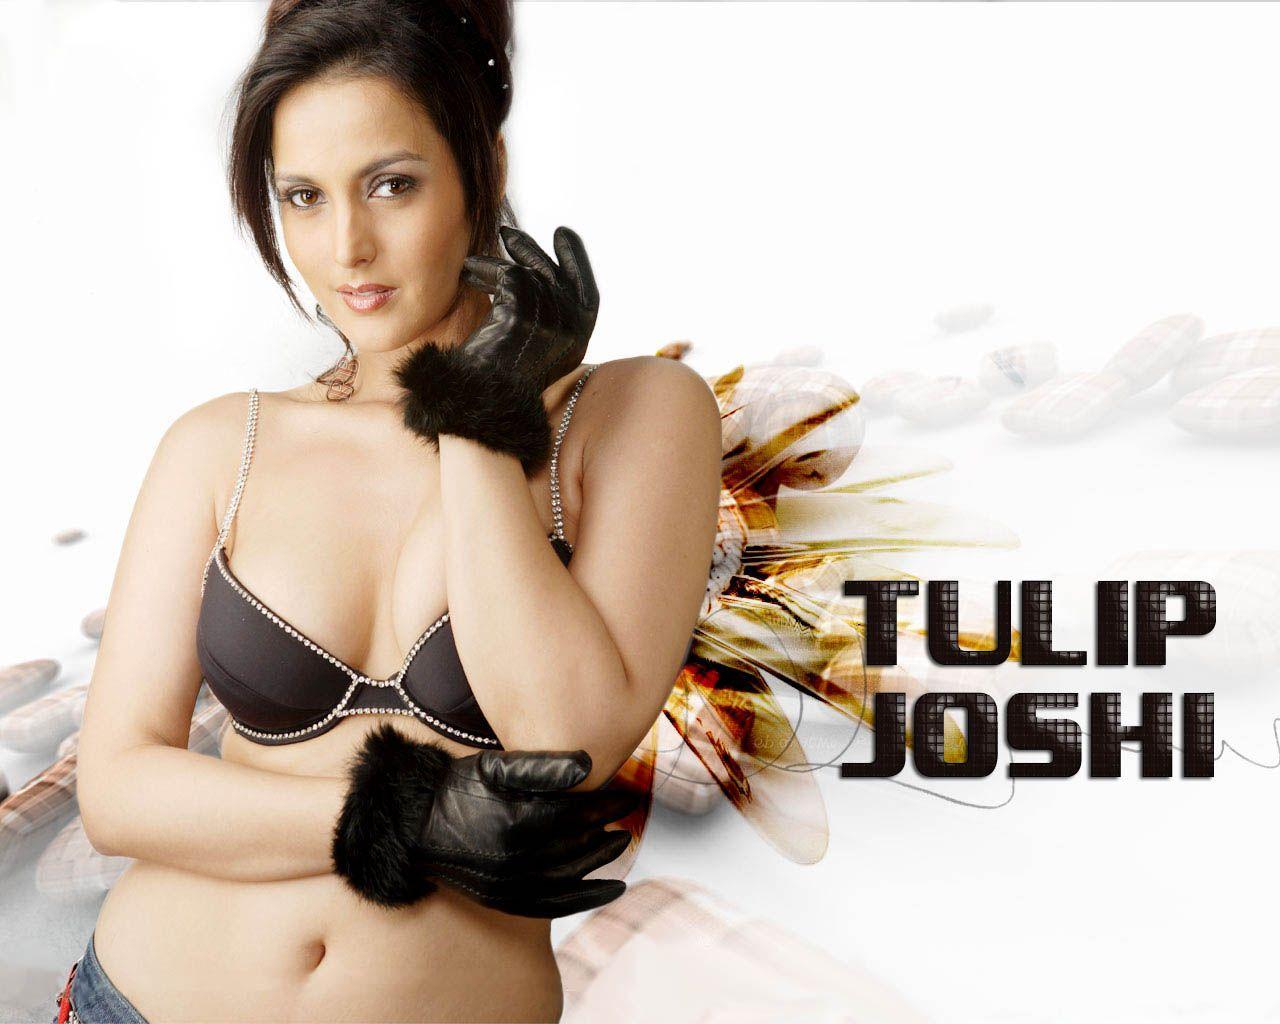 Tulip joshi nude naked pichare